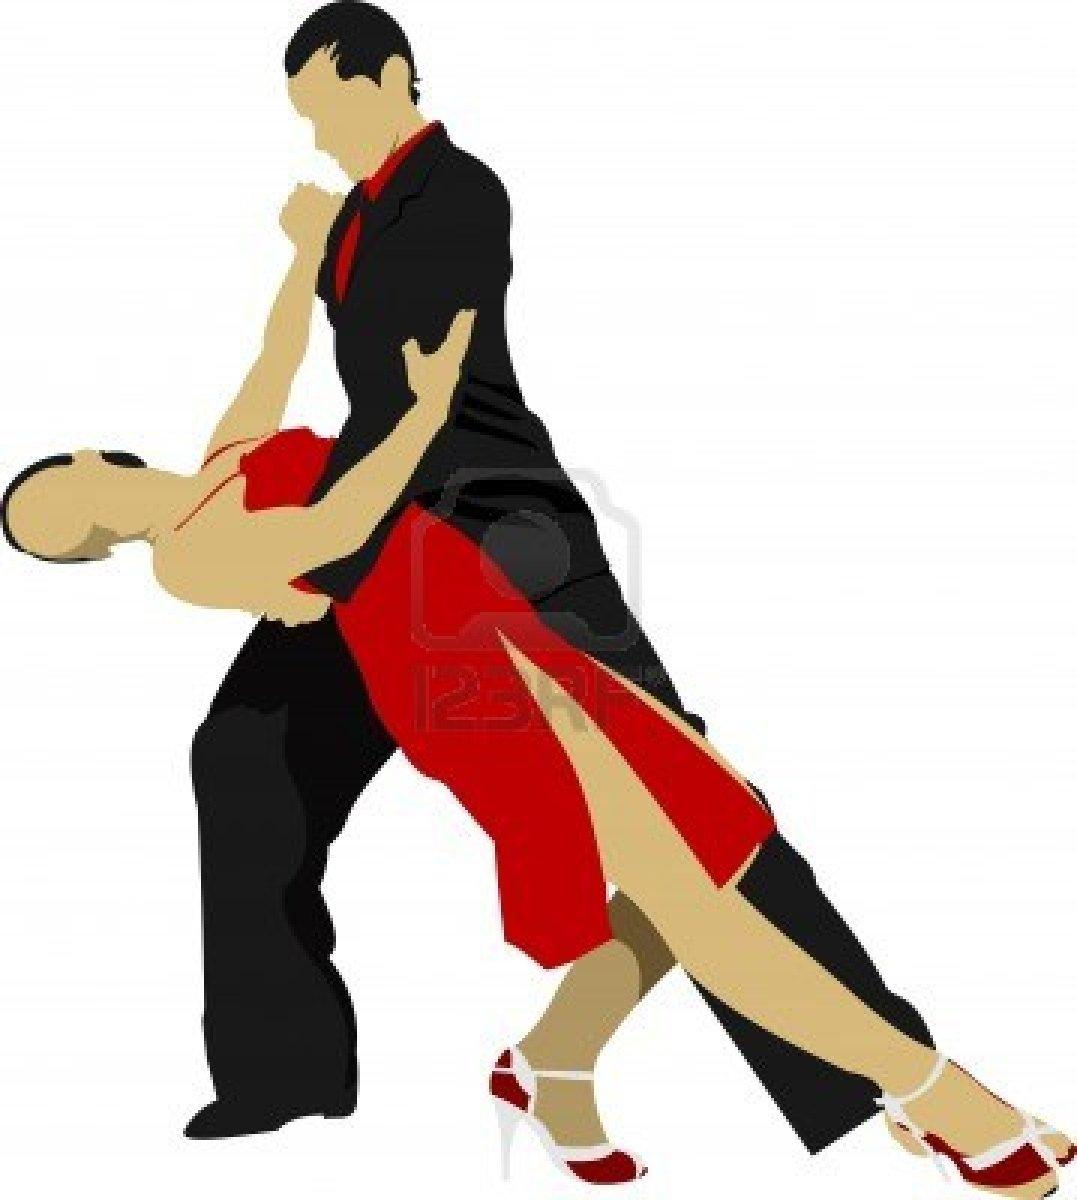 muzyki tango jest al tango | Clipart Panda - Free Clipart ...